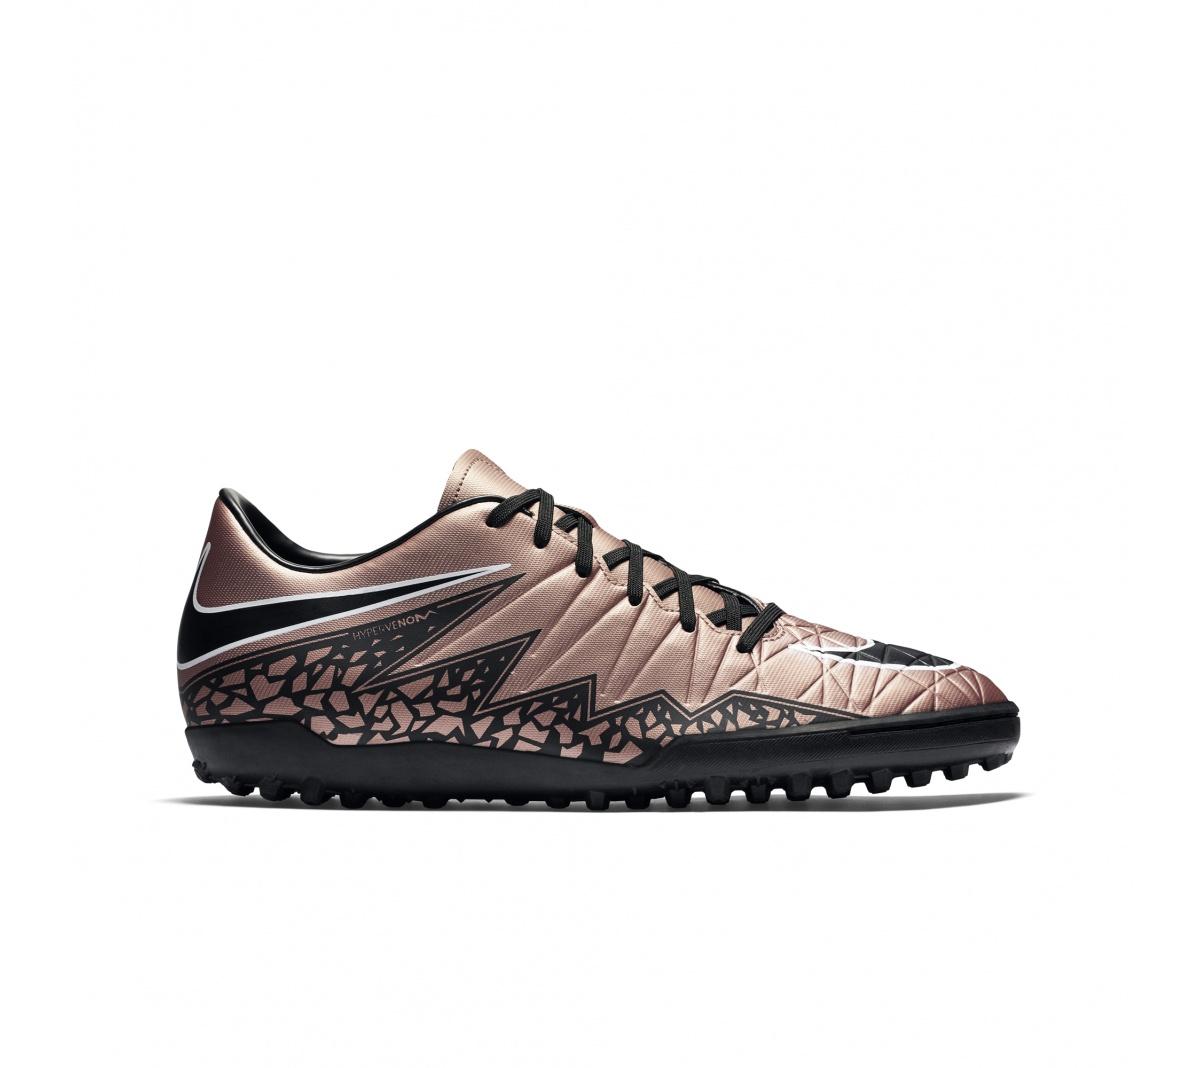 06f2eefd6f ... Chuteira Nike Hypervenom Phelon II TF Dourado com Preto e Branco ...